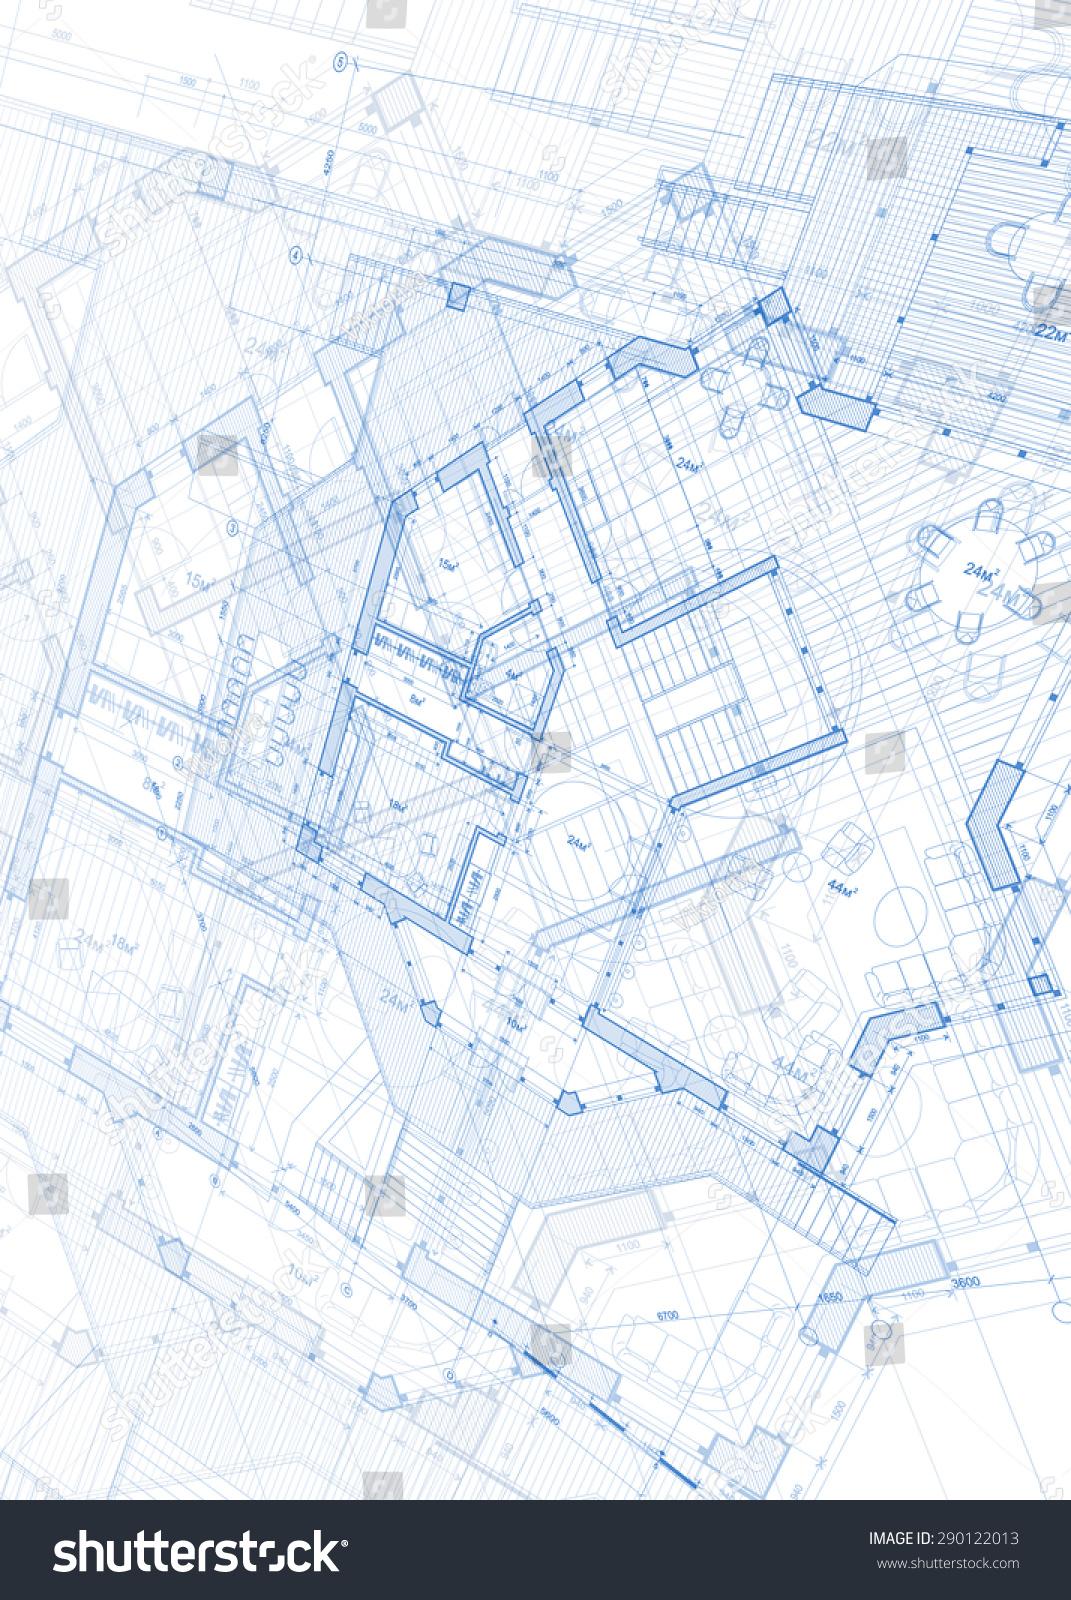 Architecture design blueprint vector illustration stock vector architecture design blueprint vector illustration malvernweather Gallery